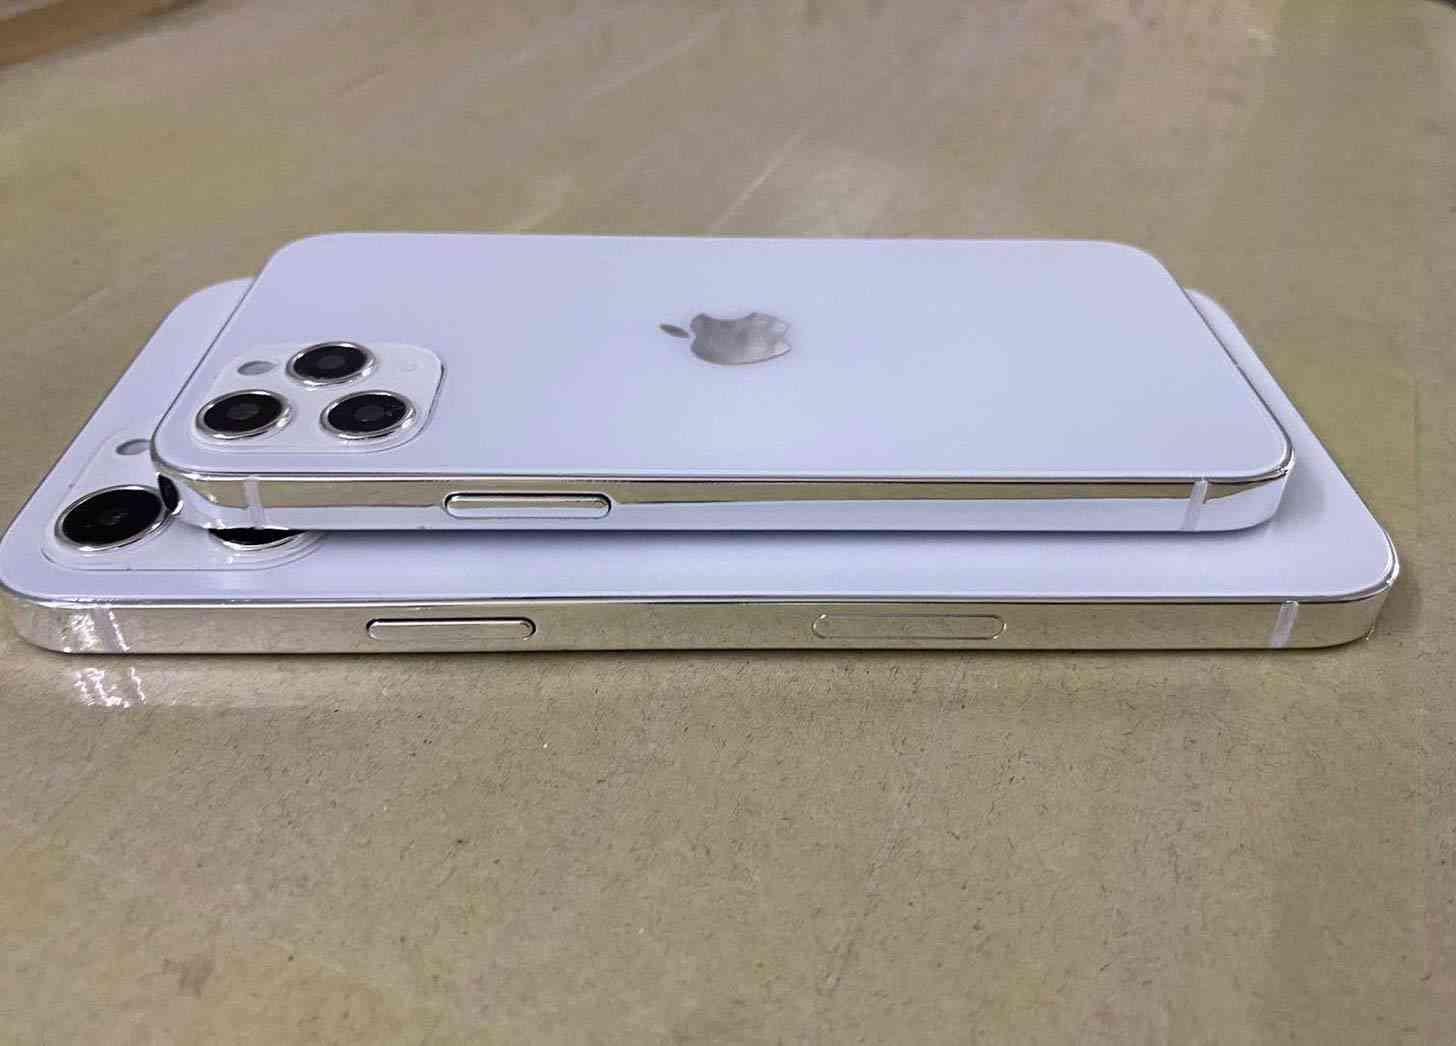 iPhone 12 design dummy models